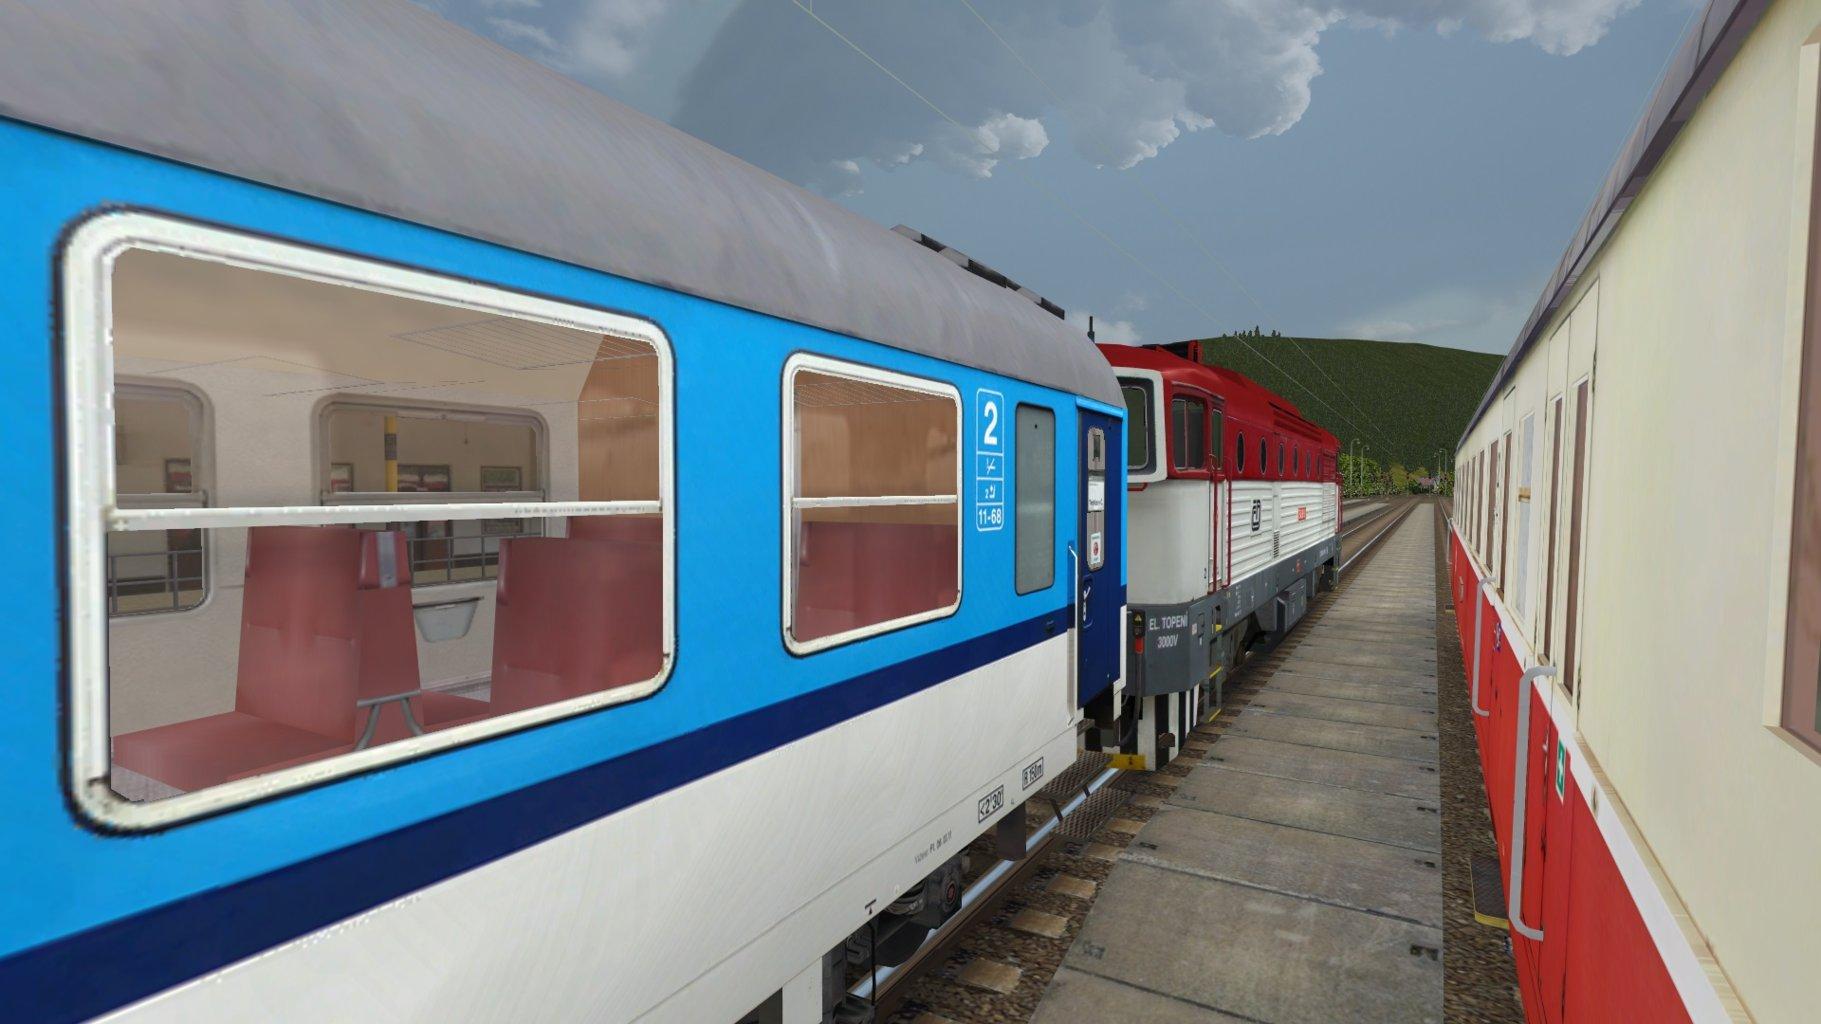 Open Rails 2021-07-21 08-48-25.jpg